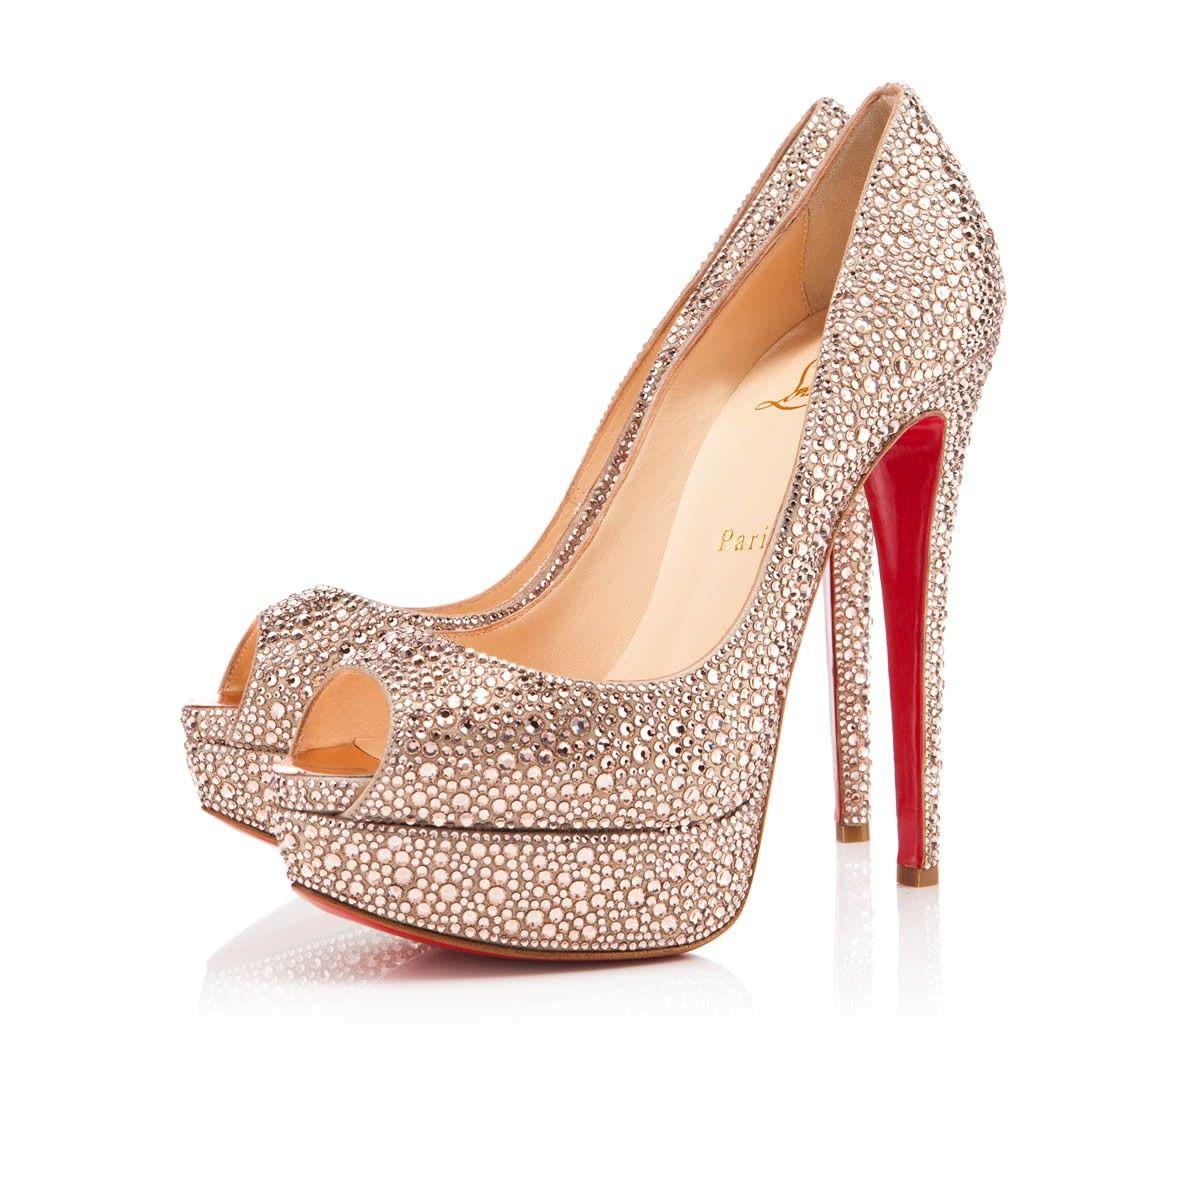 christian louboutin wedding shoes 2015